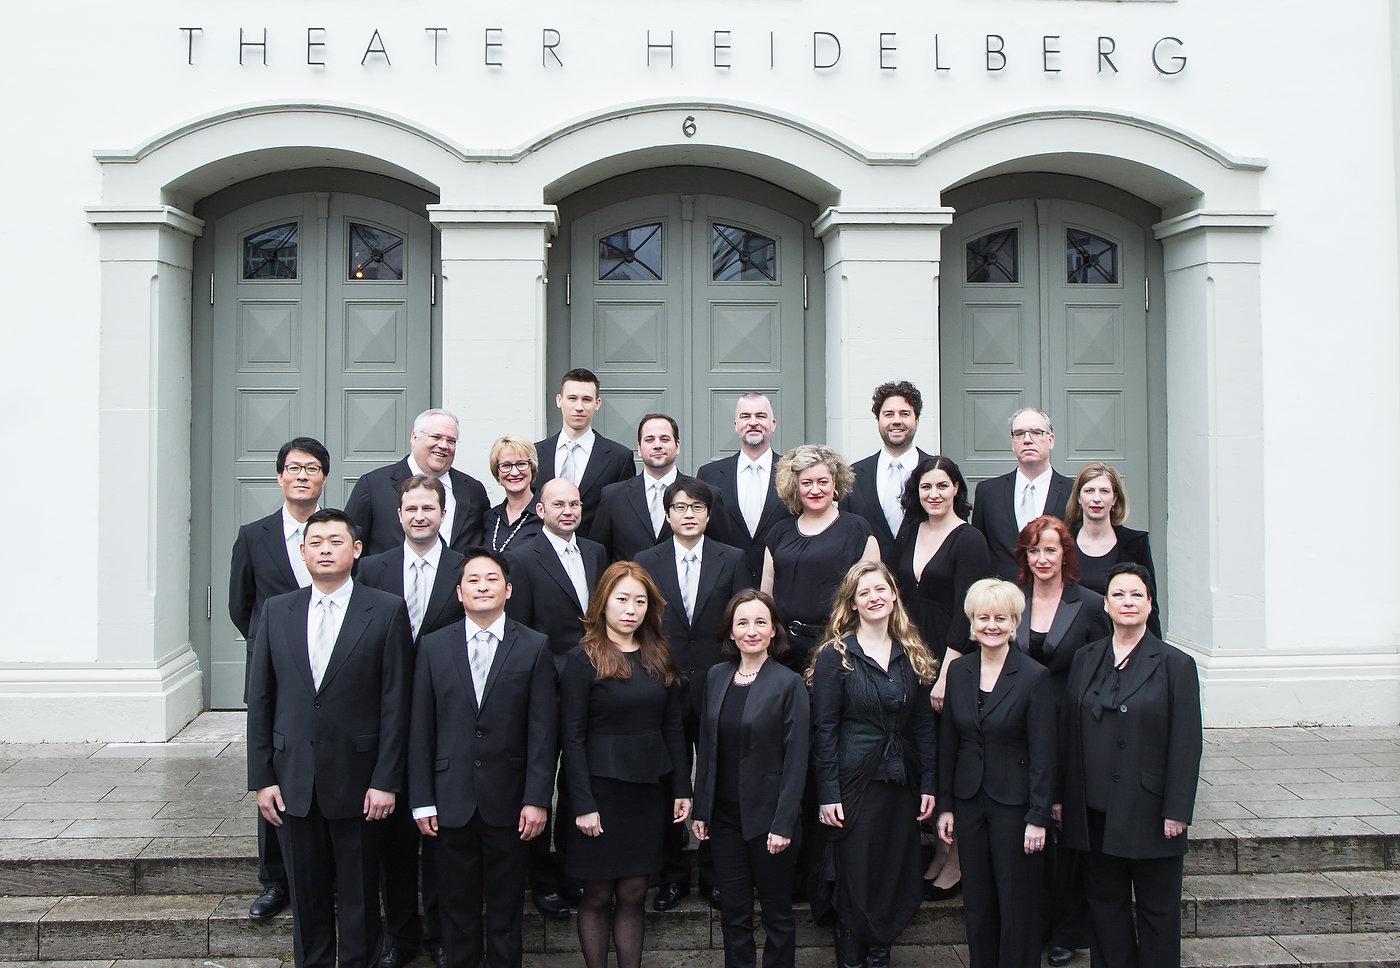 Gruppenbild des Opernchores Theater Heidelberg